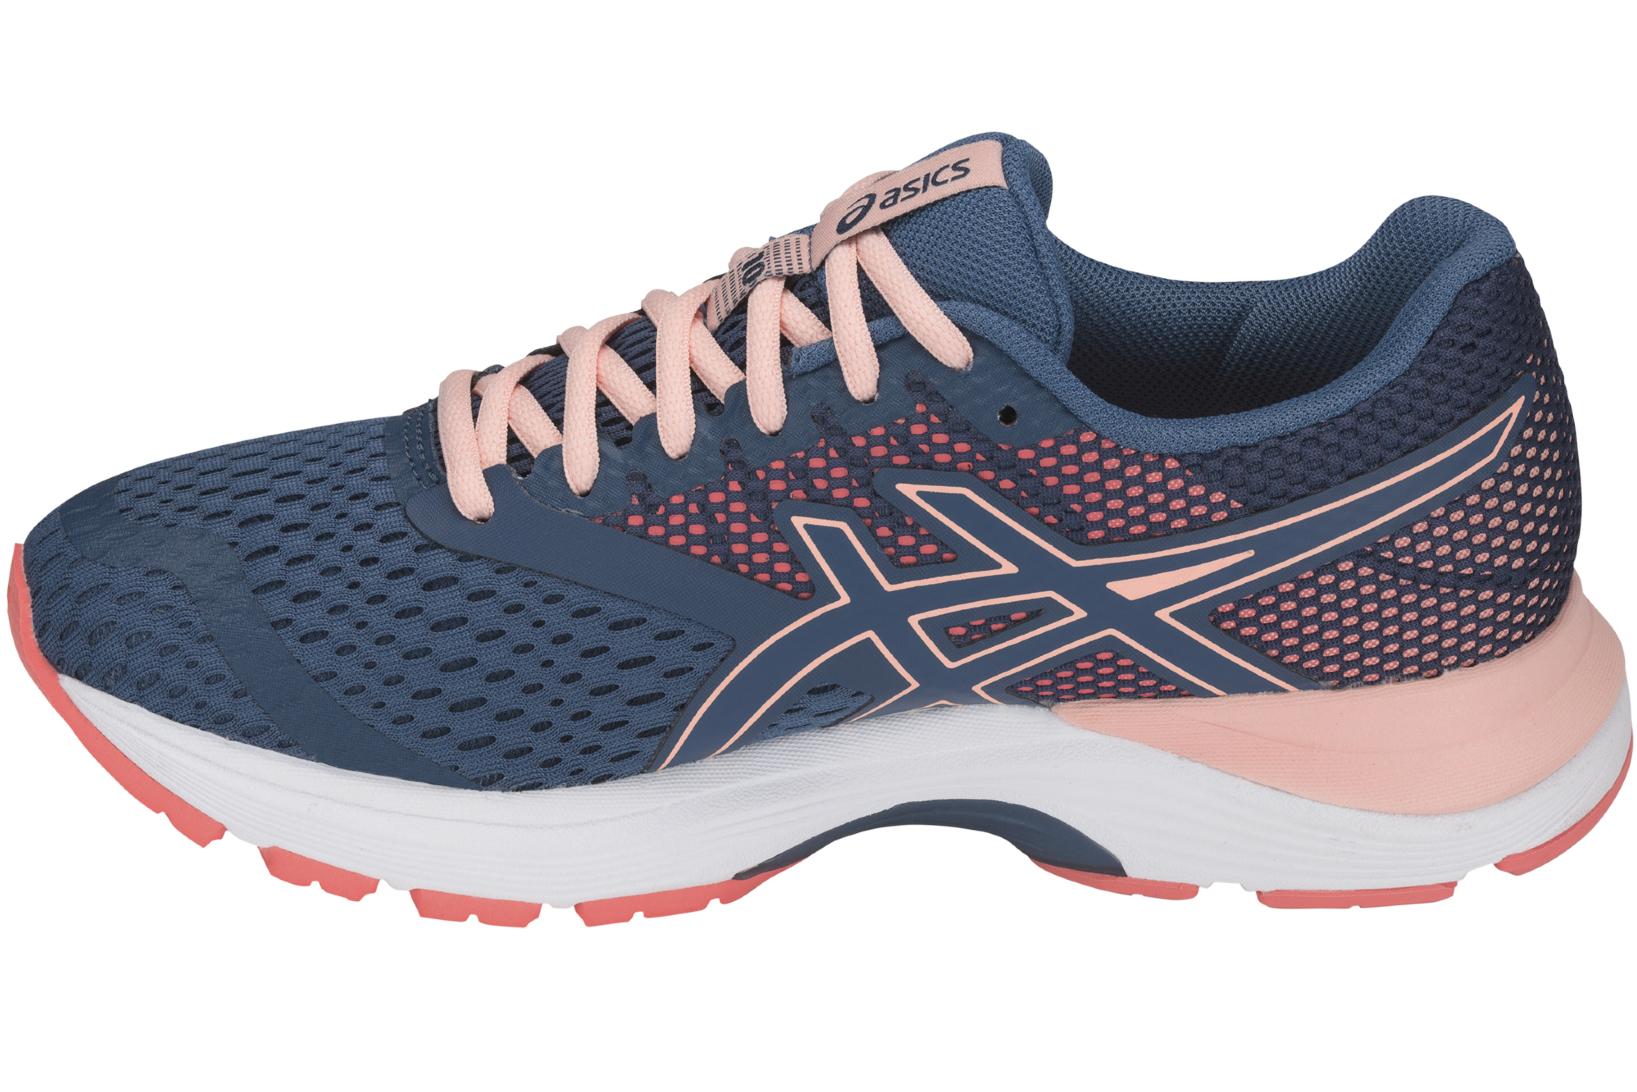 76a814356657a Bežecká obuv Asics Gel-Pulse 10 - 1012A010-402 | Shopline.sk